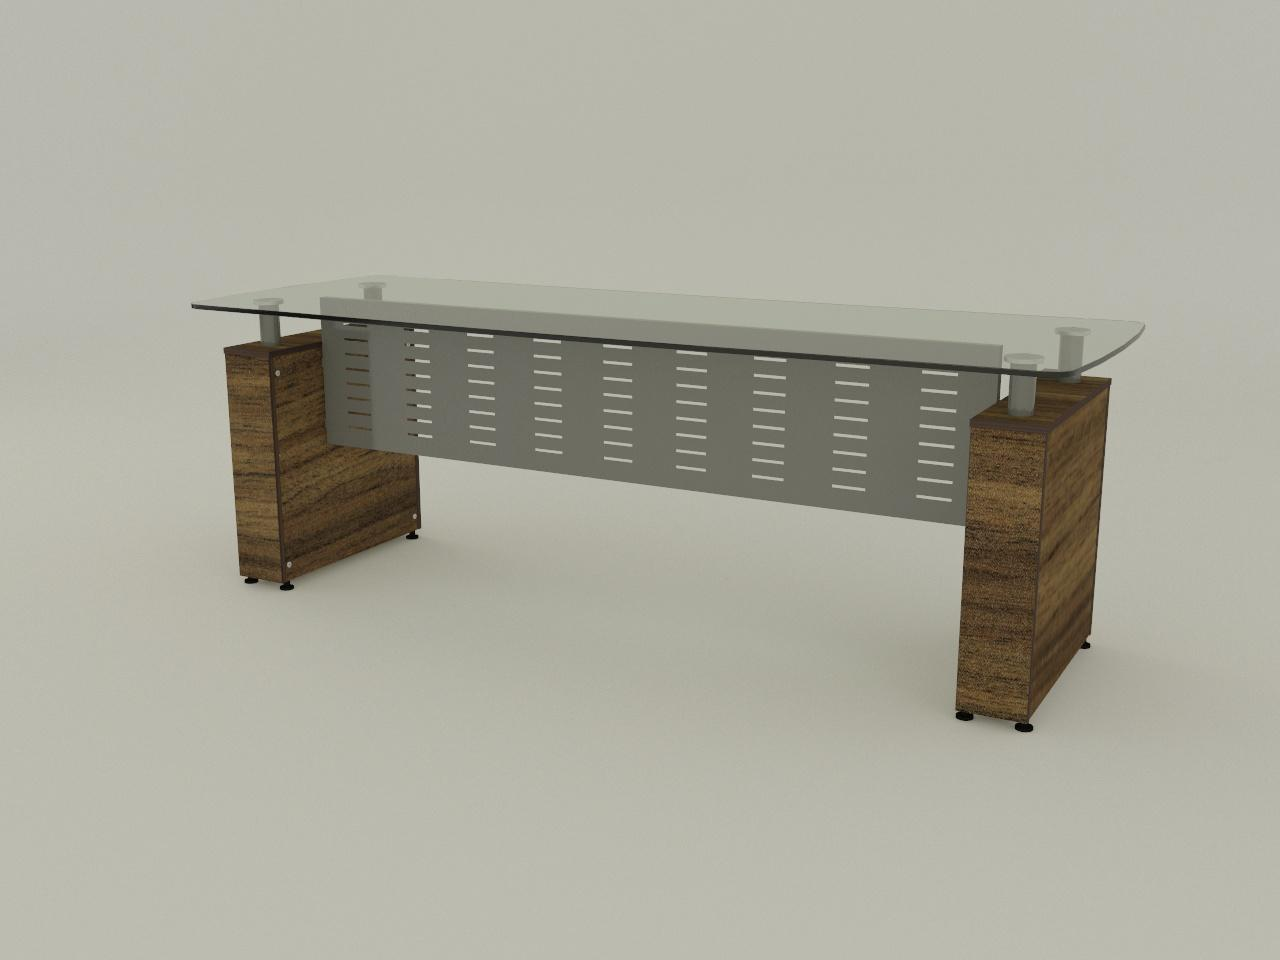 escritorio boston sop 150mm 220 x 80 cm cub cristal 12mm